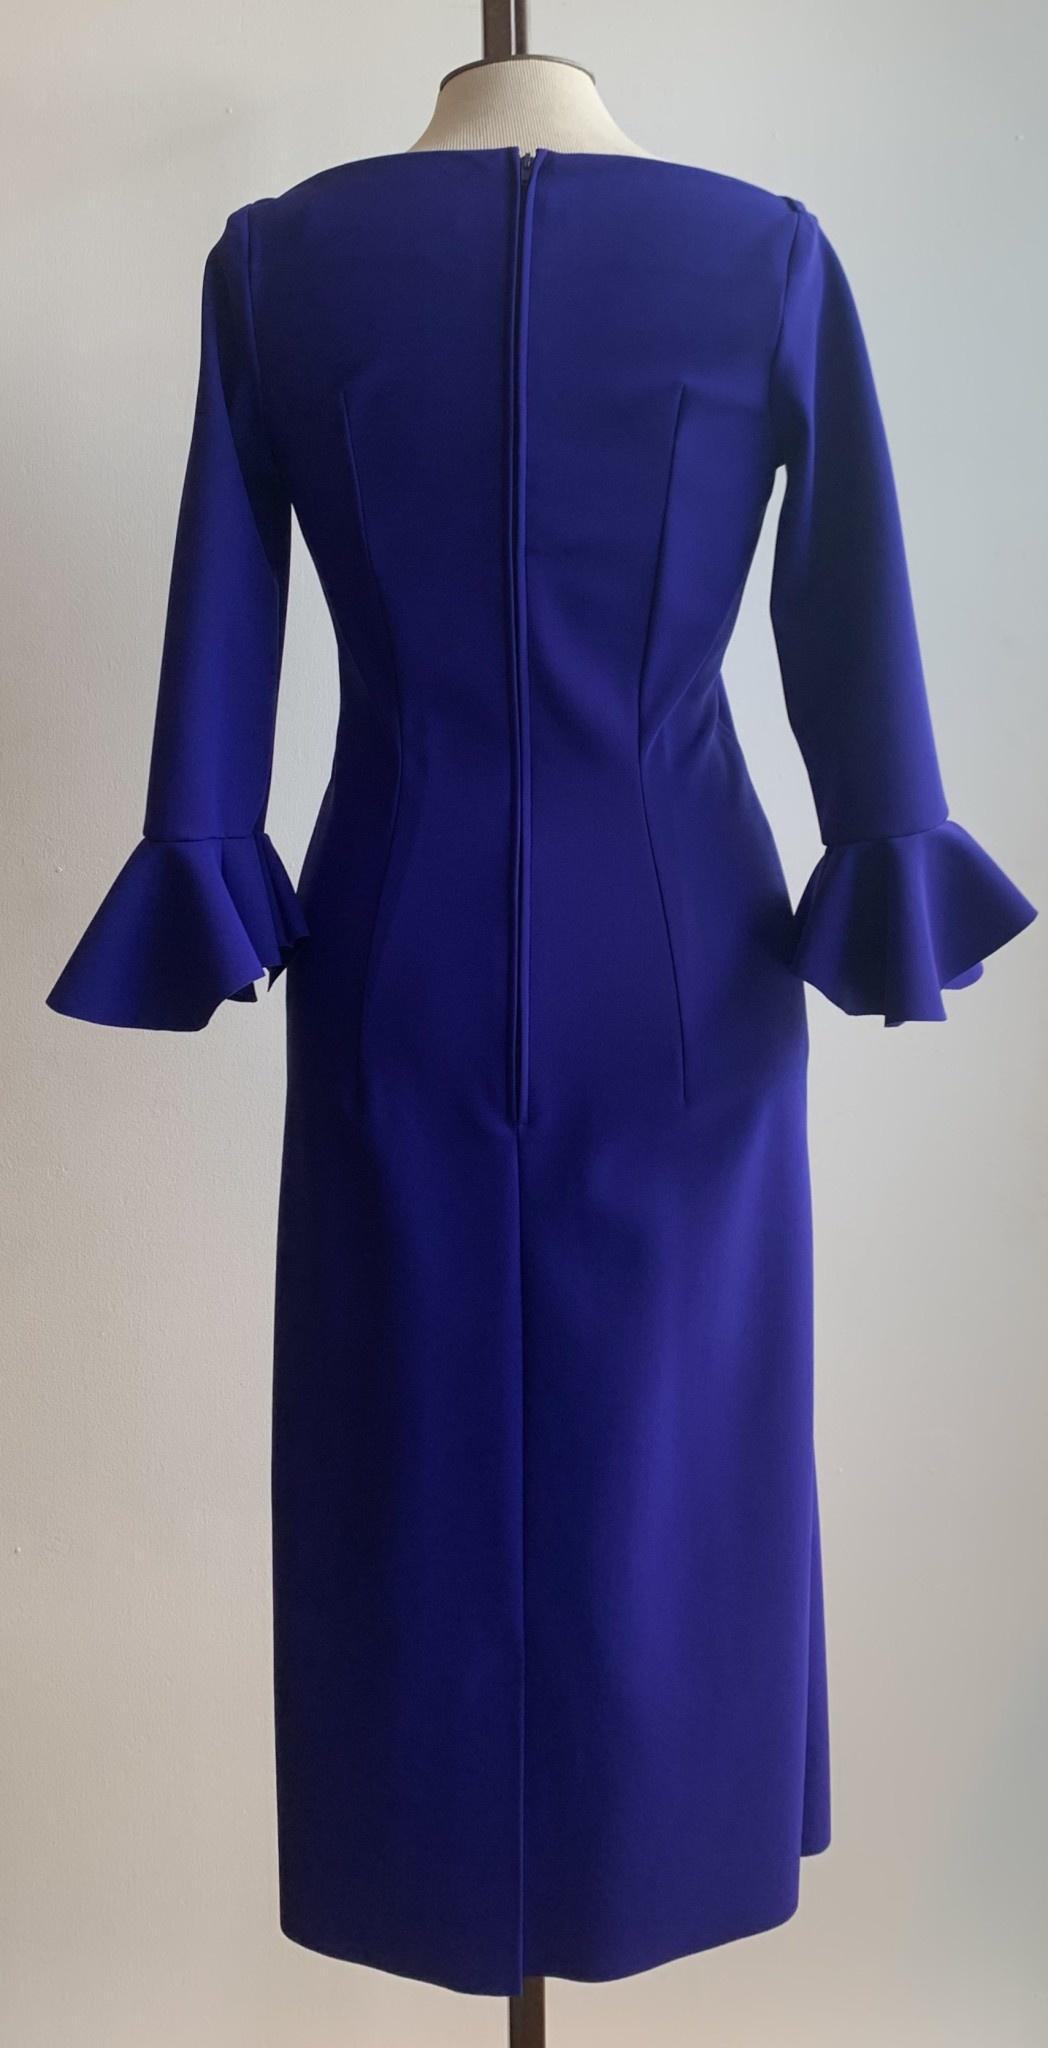 Greta Constantine Oswald Dress